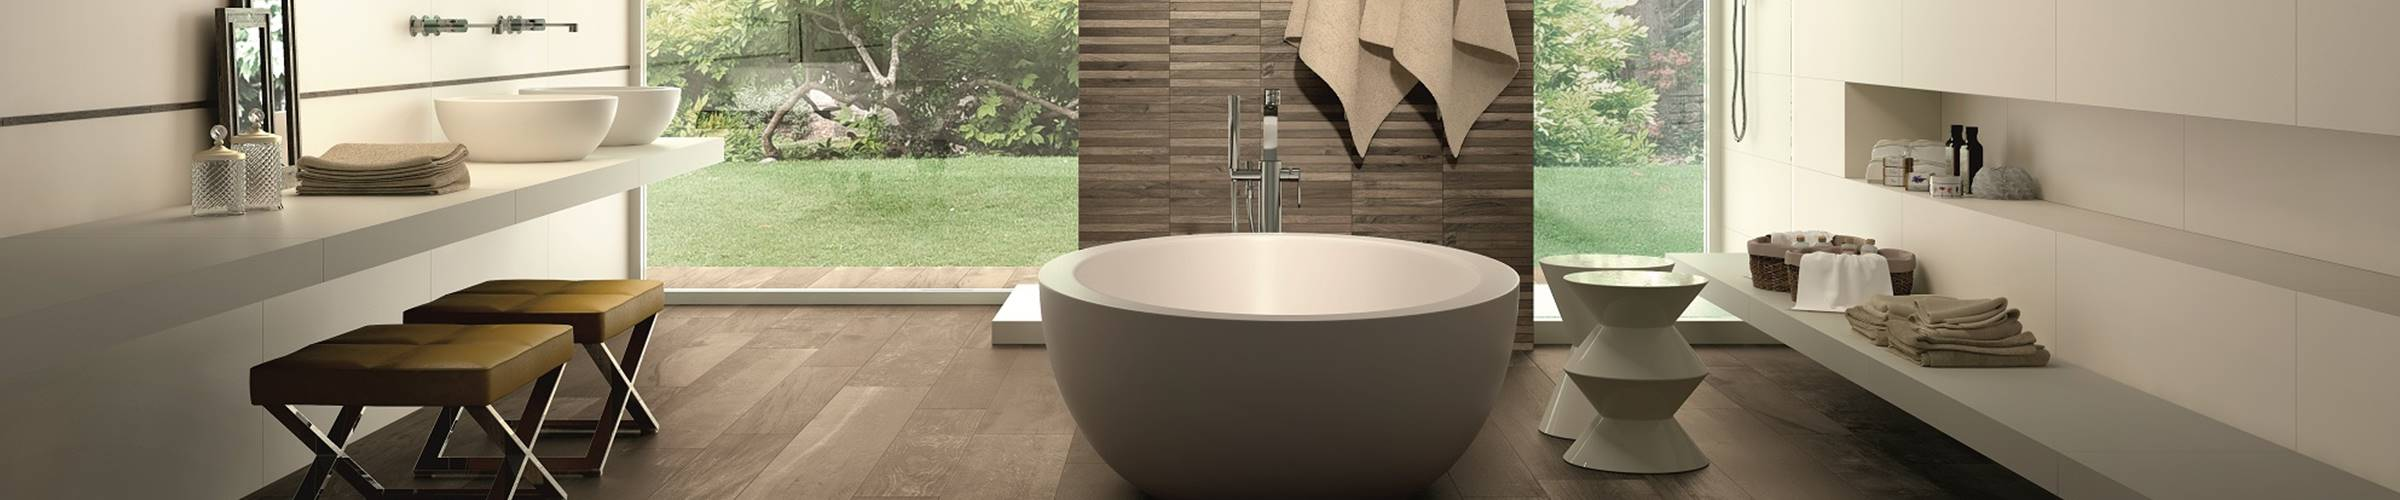 bad wellness reisegger fliesen gmbh aus senftenbach bezirk ried i i. Black Bedroom Furniture Sets. Home Design Ideas